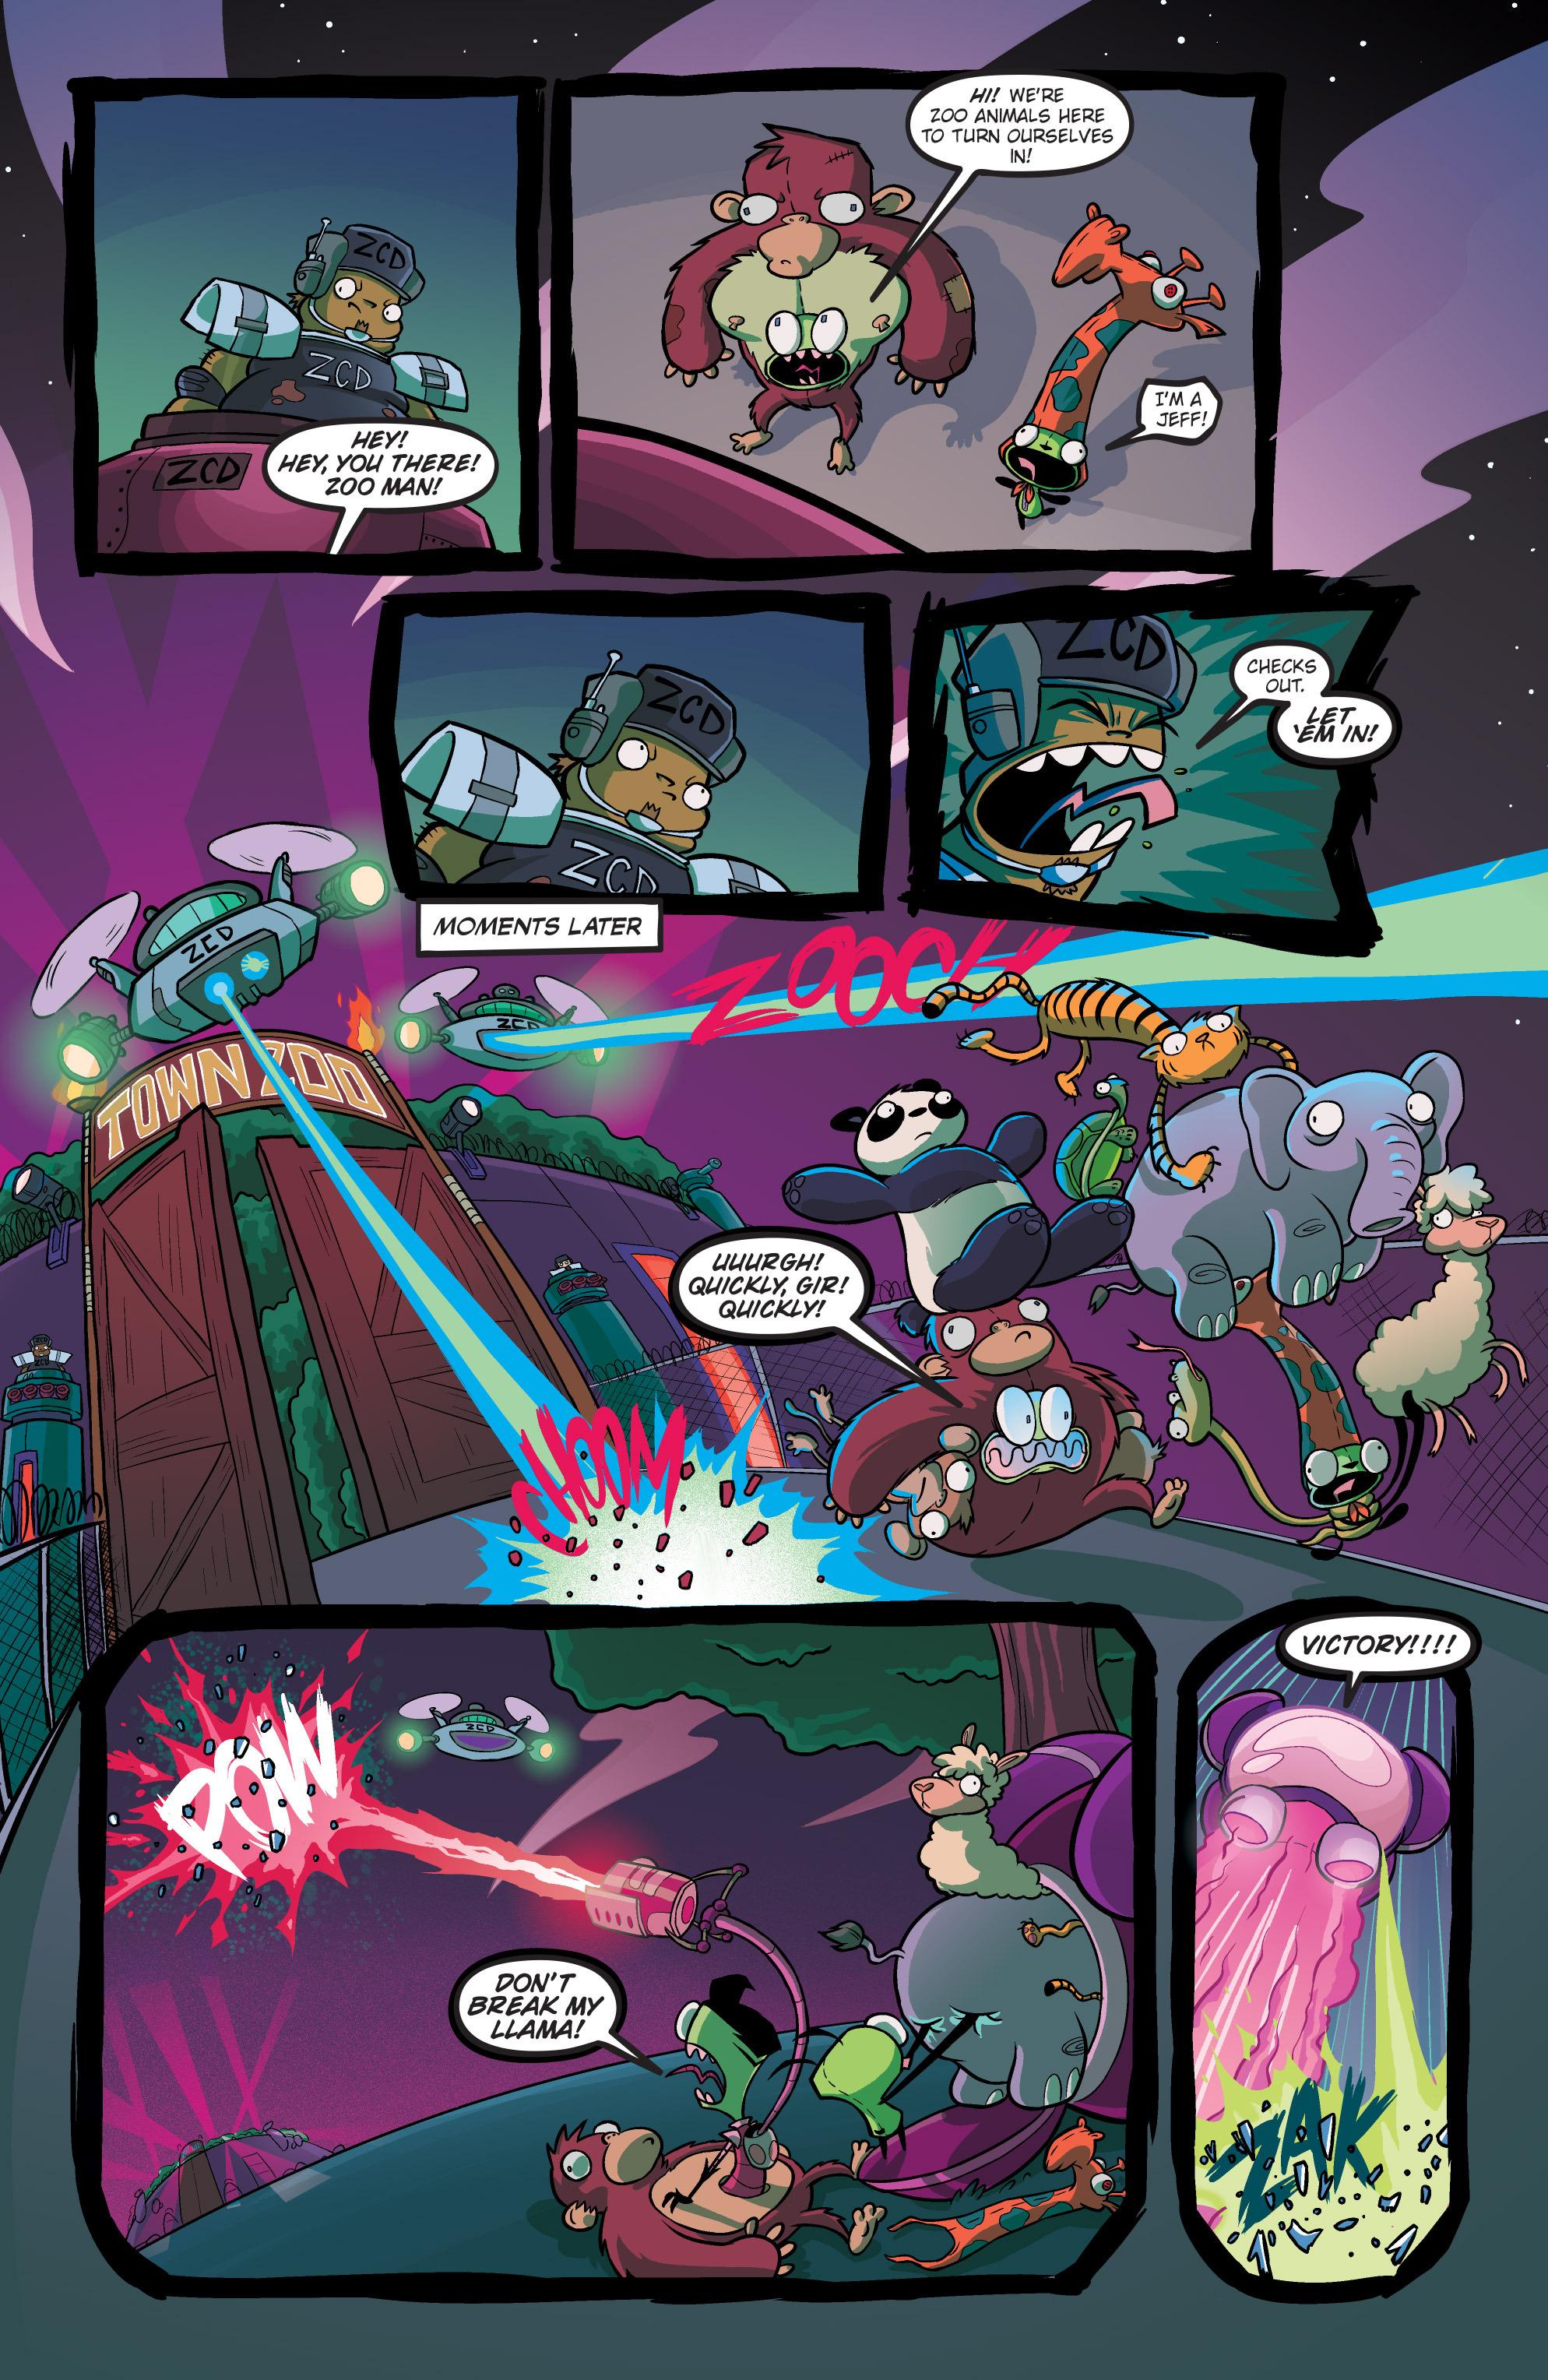 Read online Invader Zim comic -  Issue #19 - 19